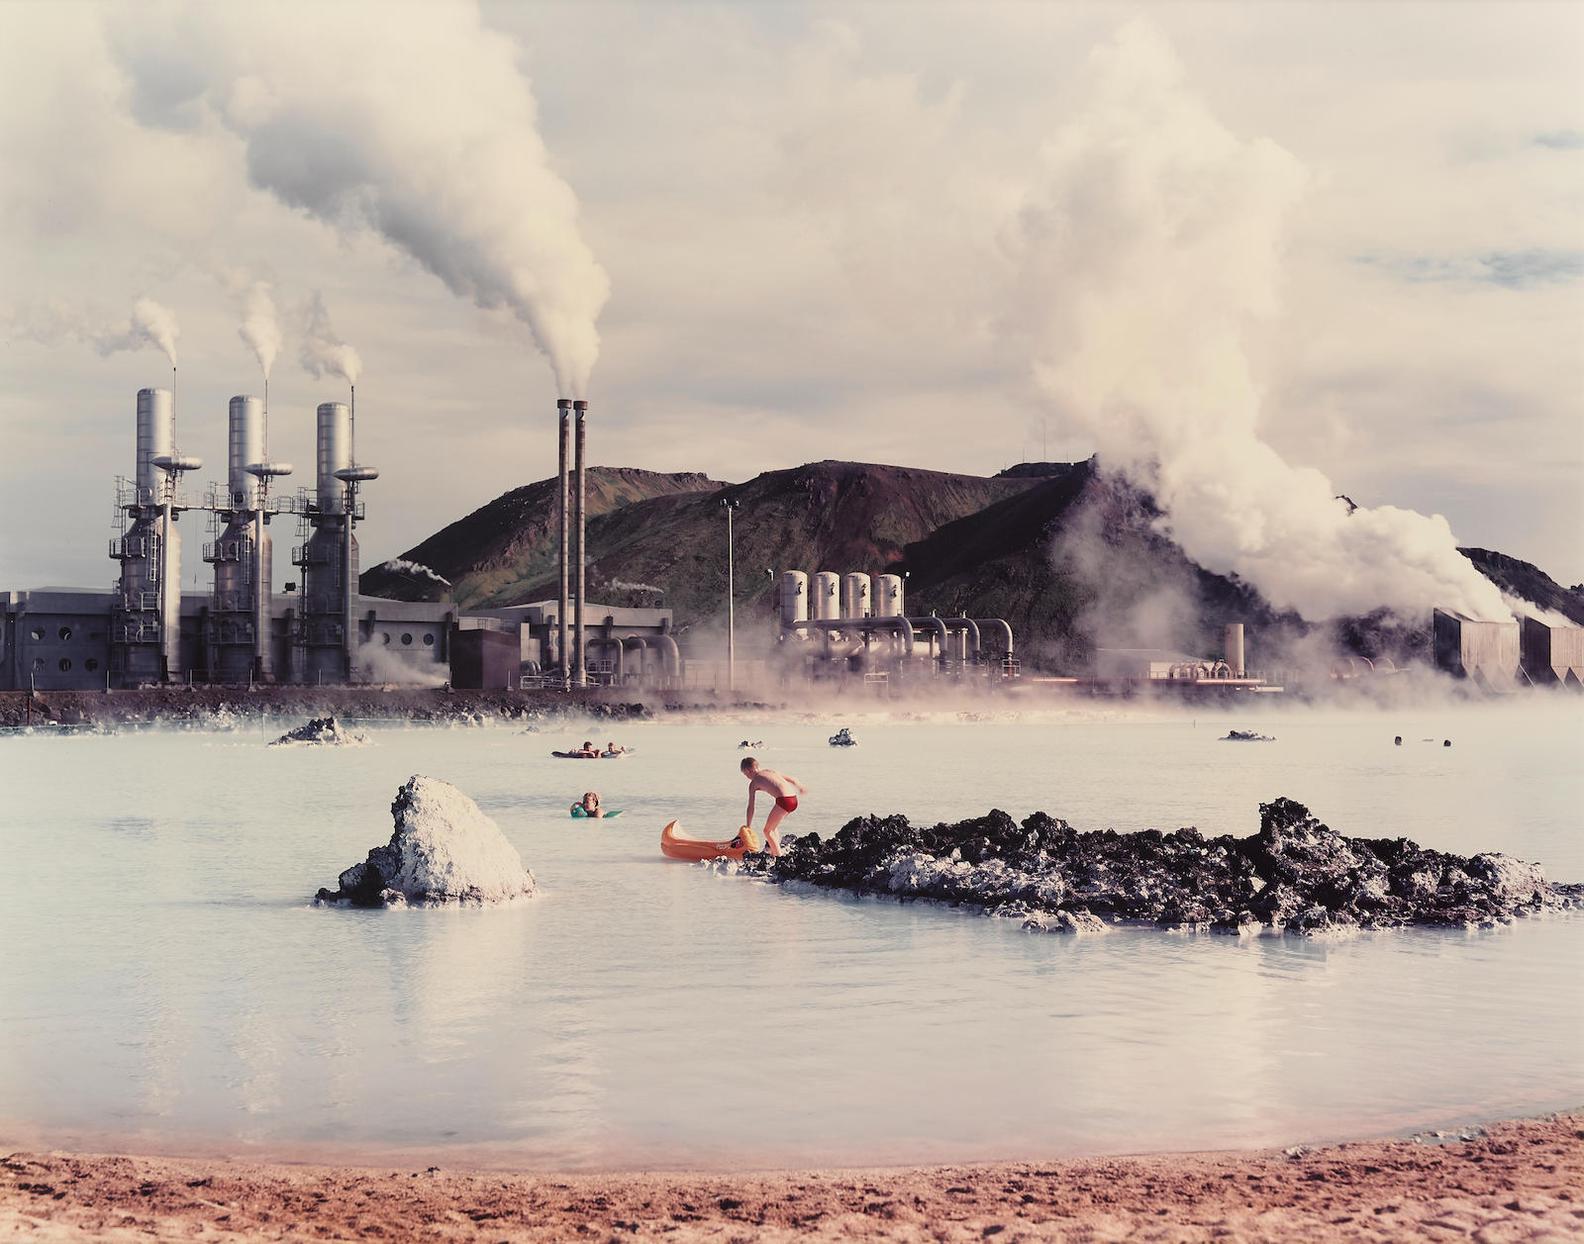 Virginia Beahan & Laura Mcphee - The Blue Lagoon, Svartsengi Goethermal Pumping Station, Iceland-1988